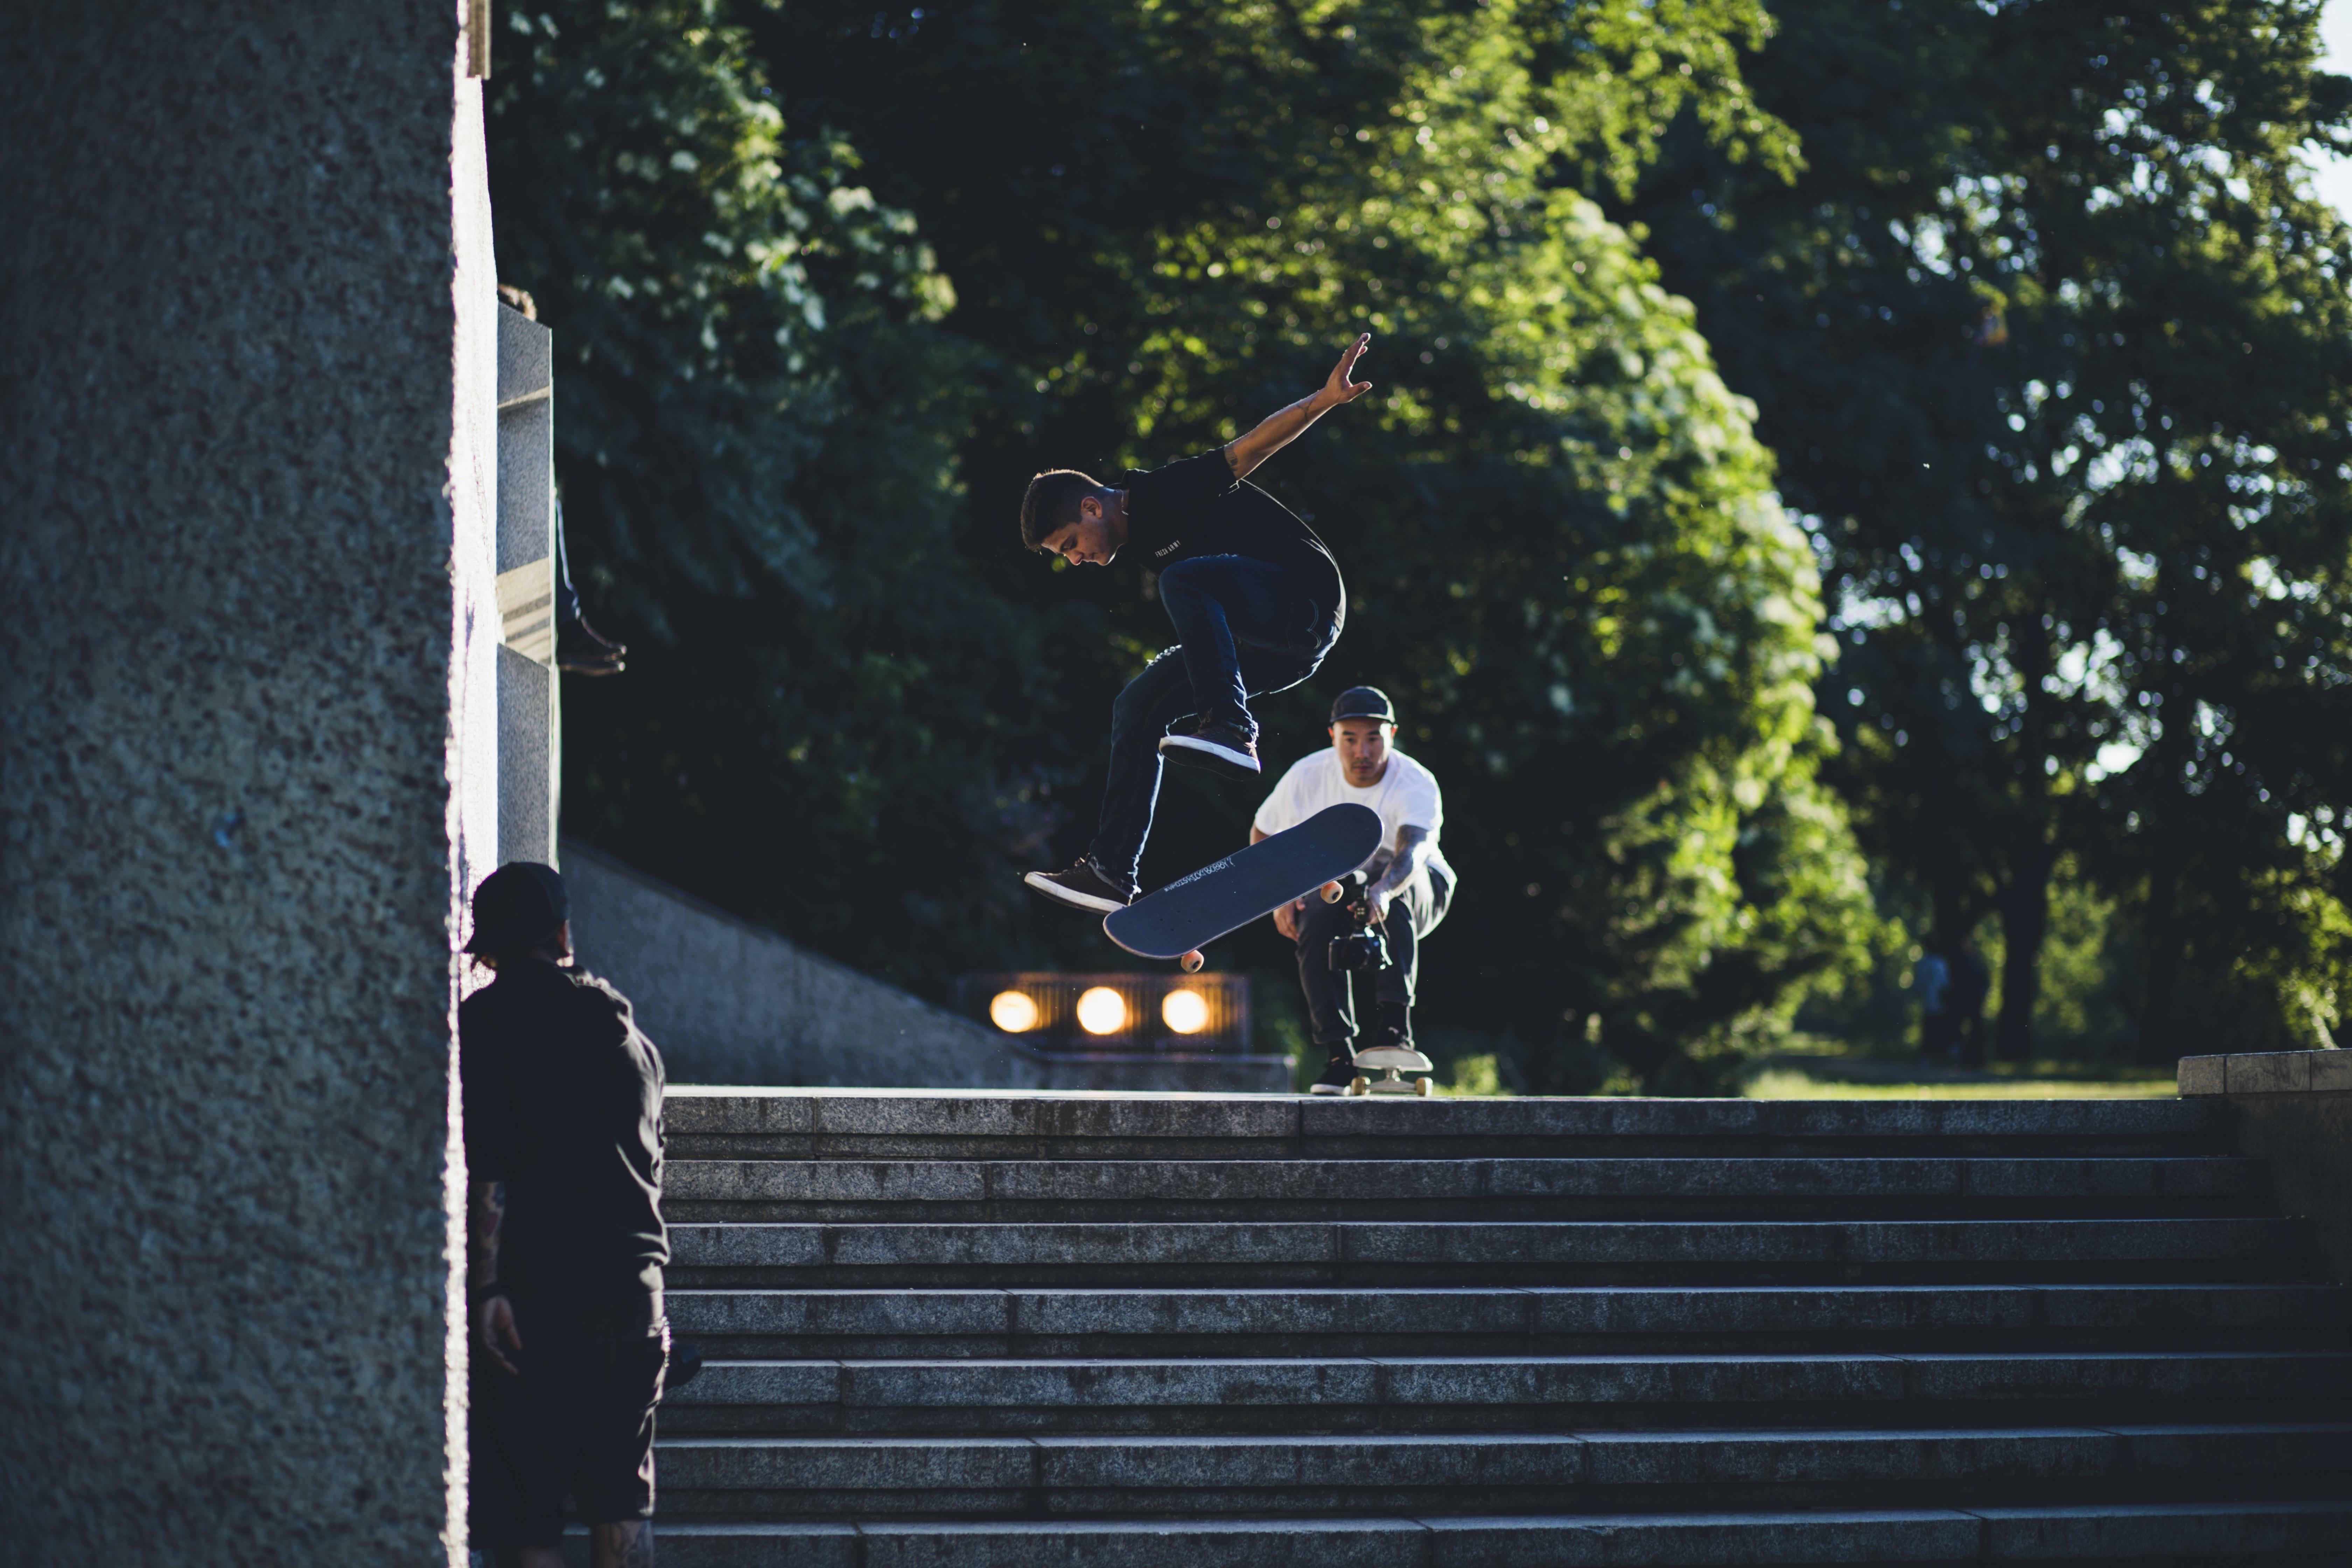 man jumping on skateboard outdoors